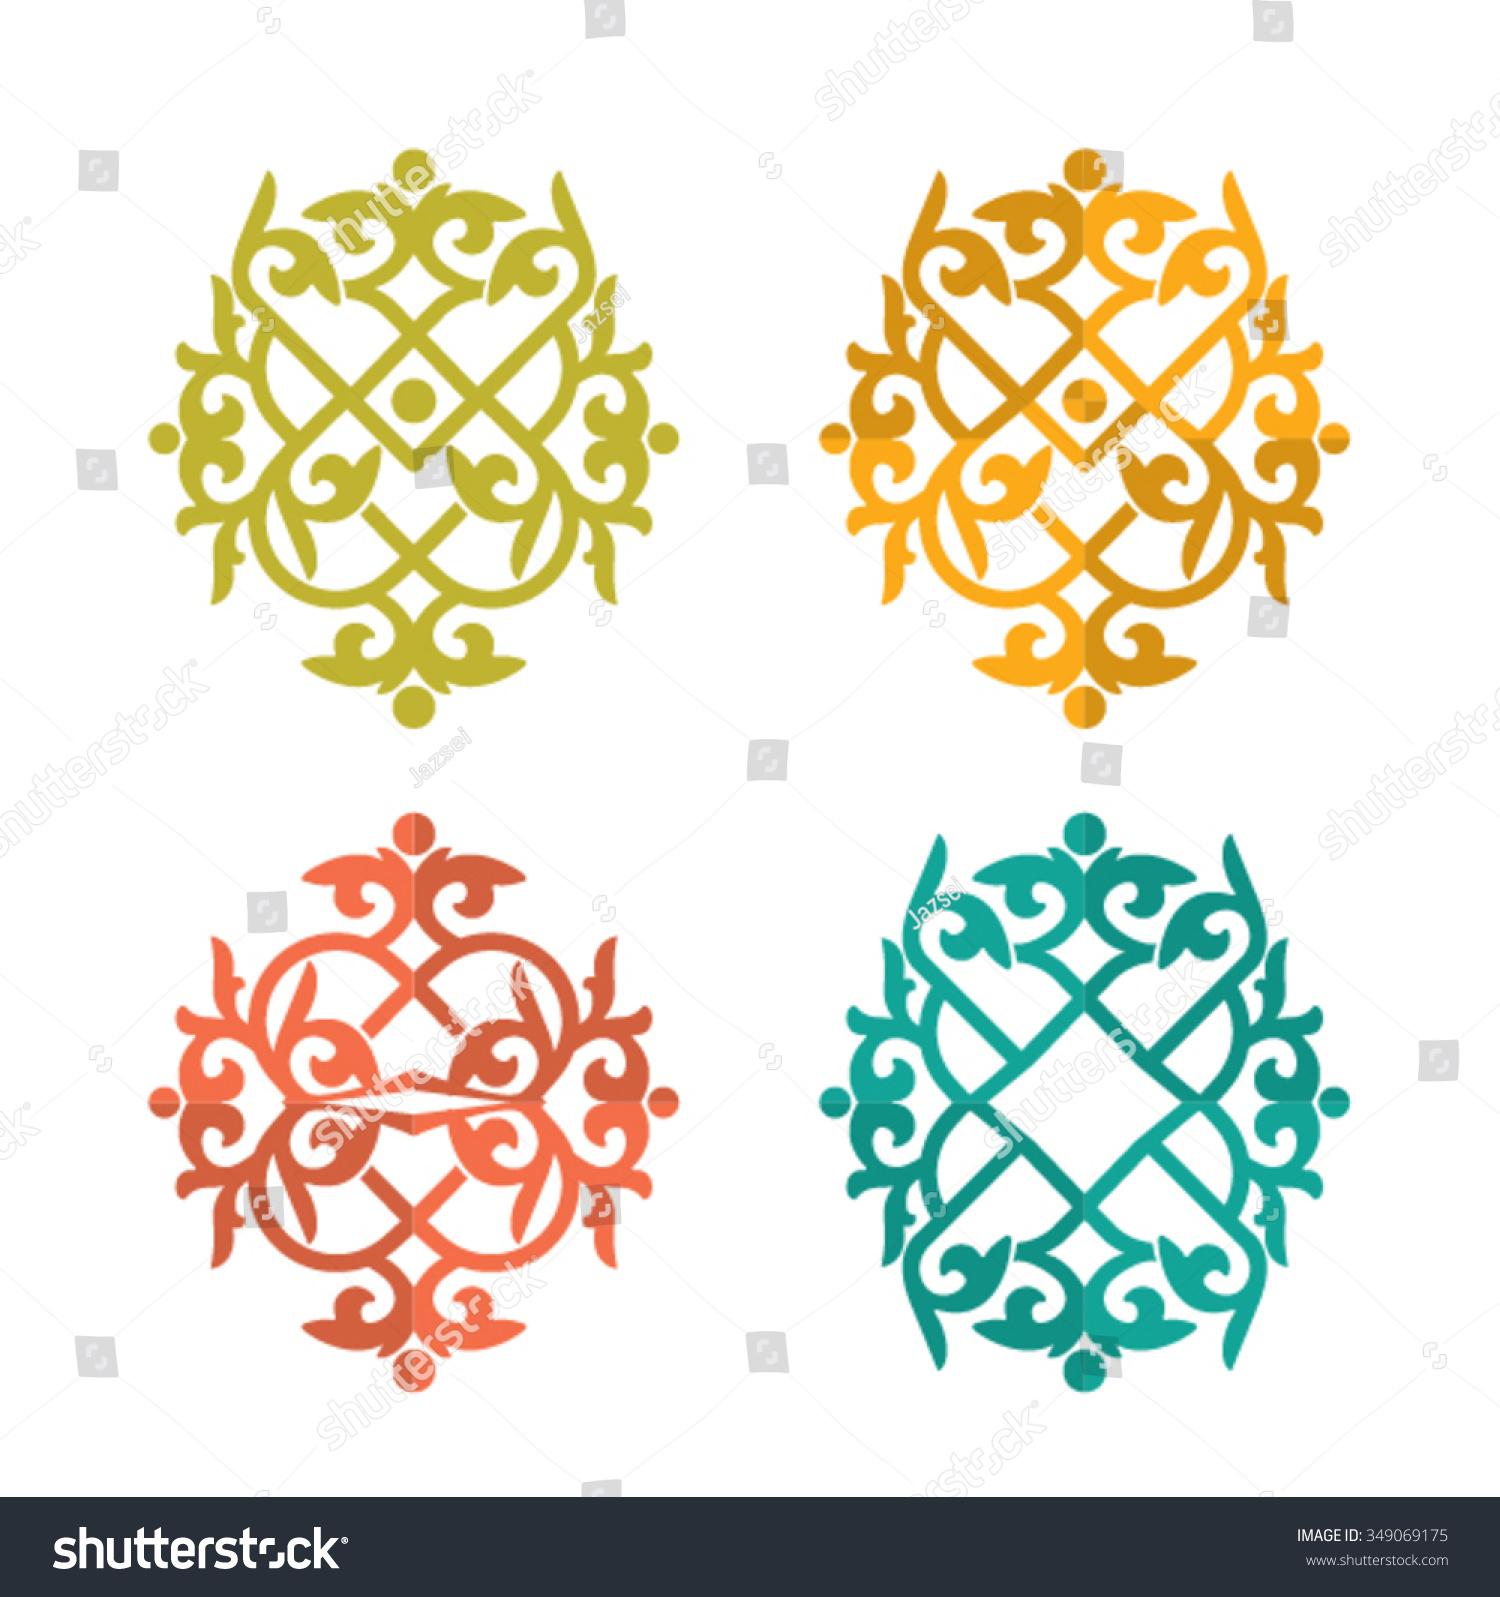 Вышивка казахский орнамент 94